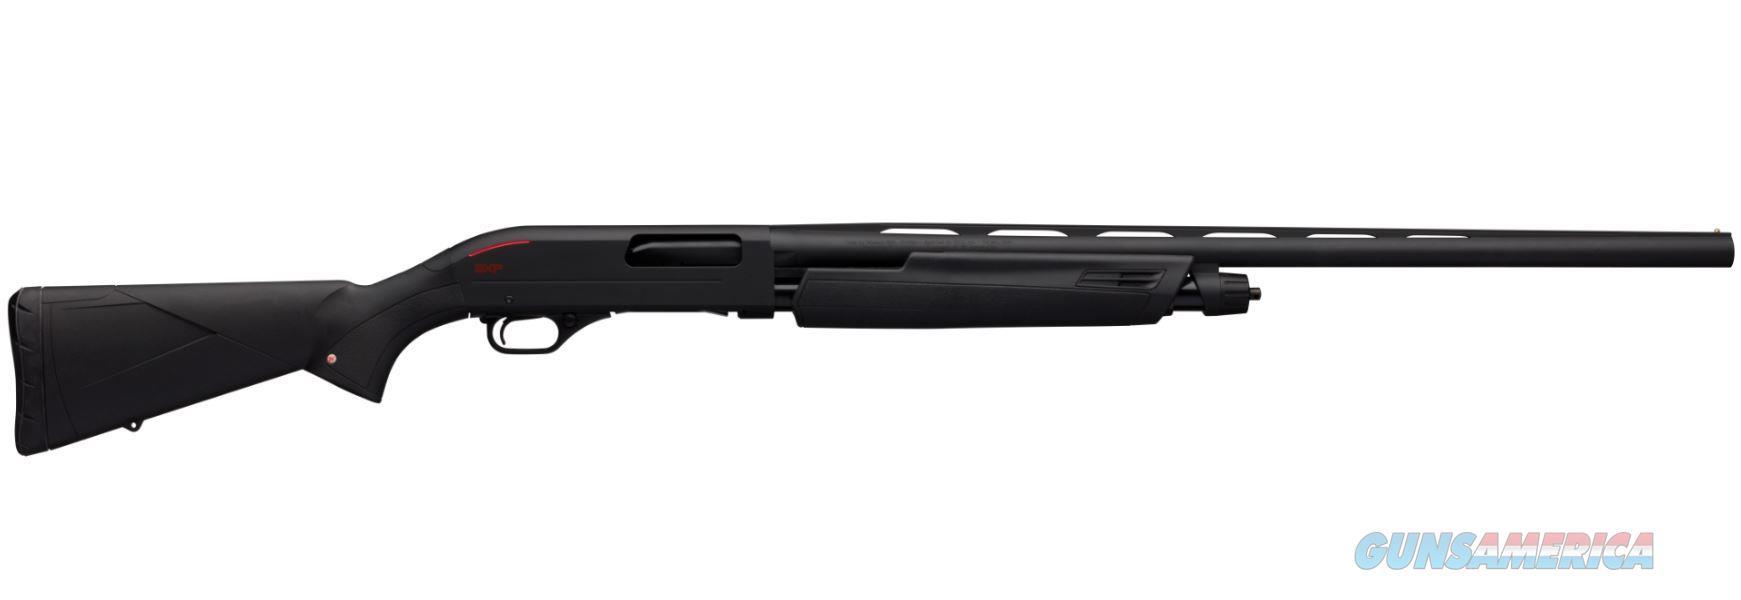 Winchester Sxp Blk Shadow 12Ga 3.5 24 512251290  Guns > Shotguns > W Misc Shotguns